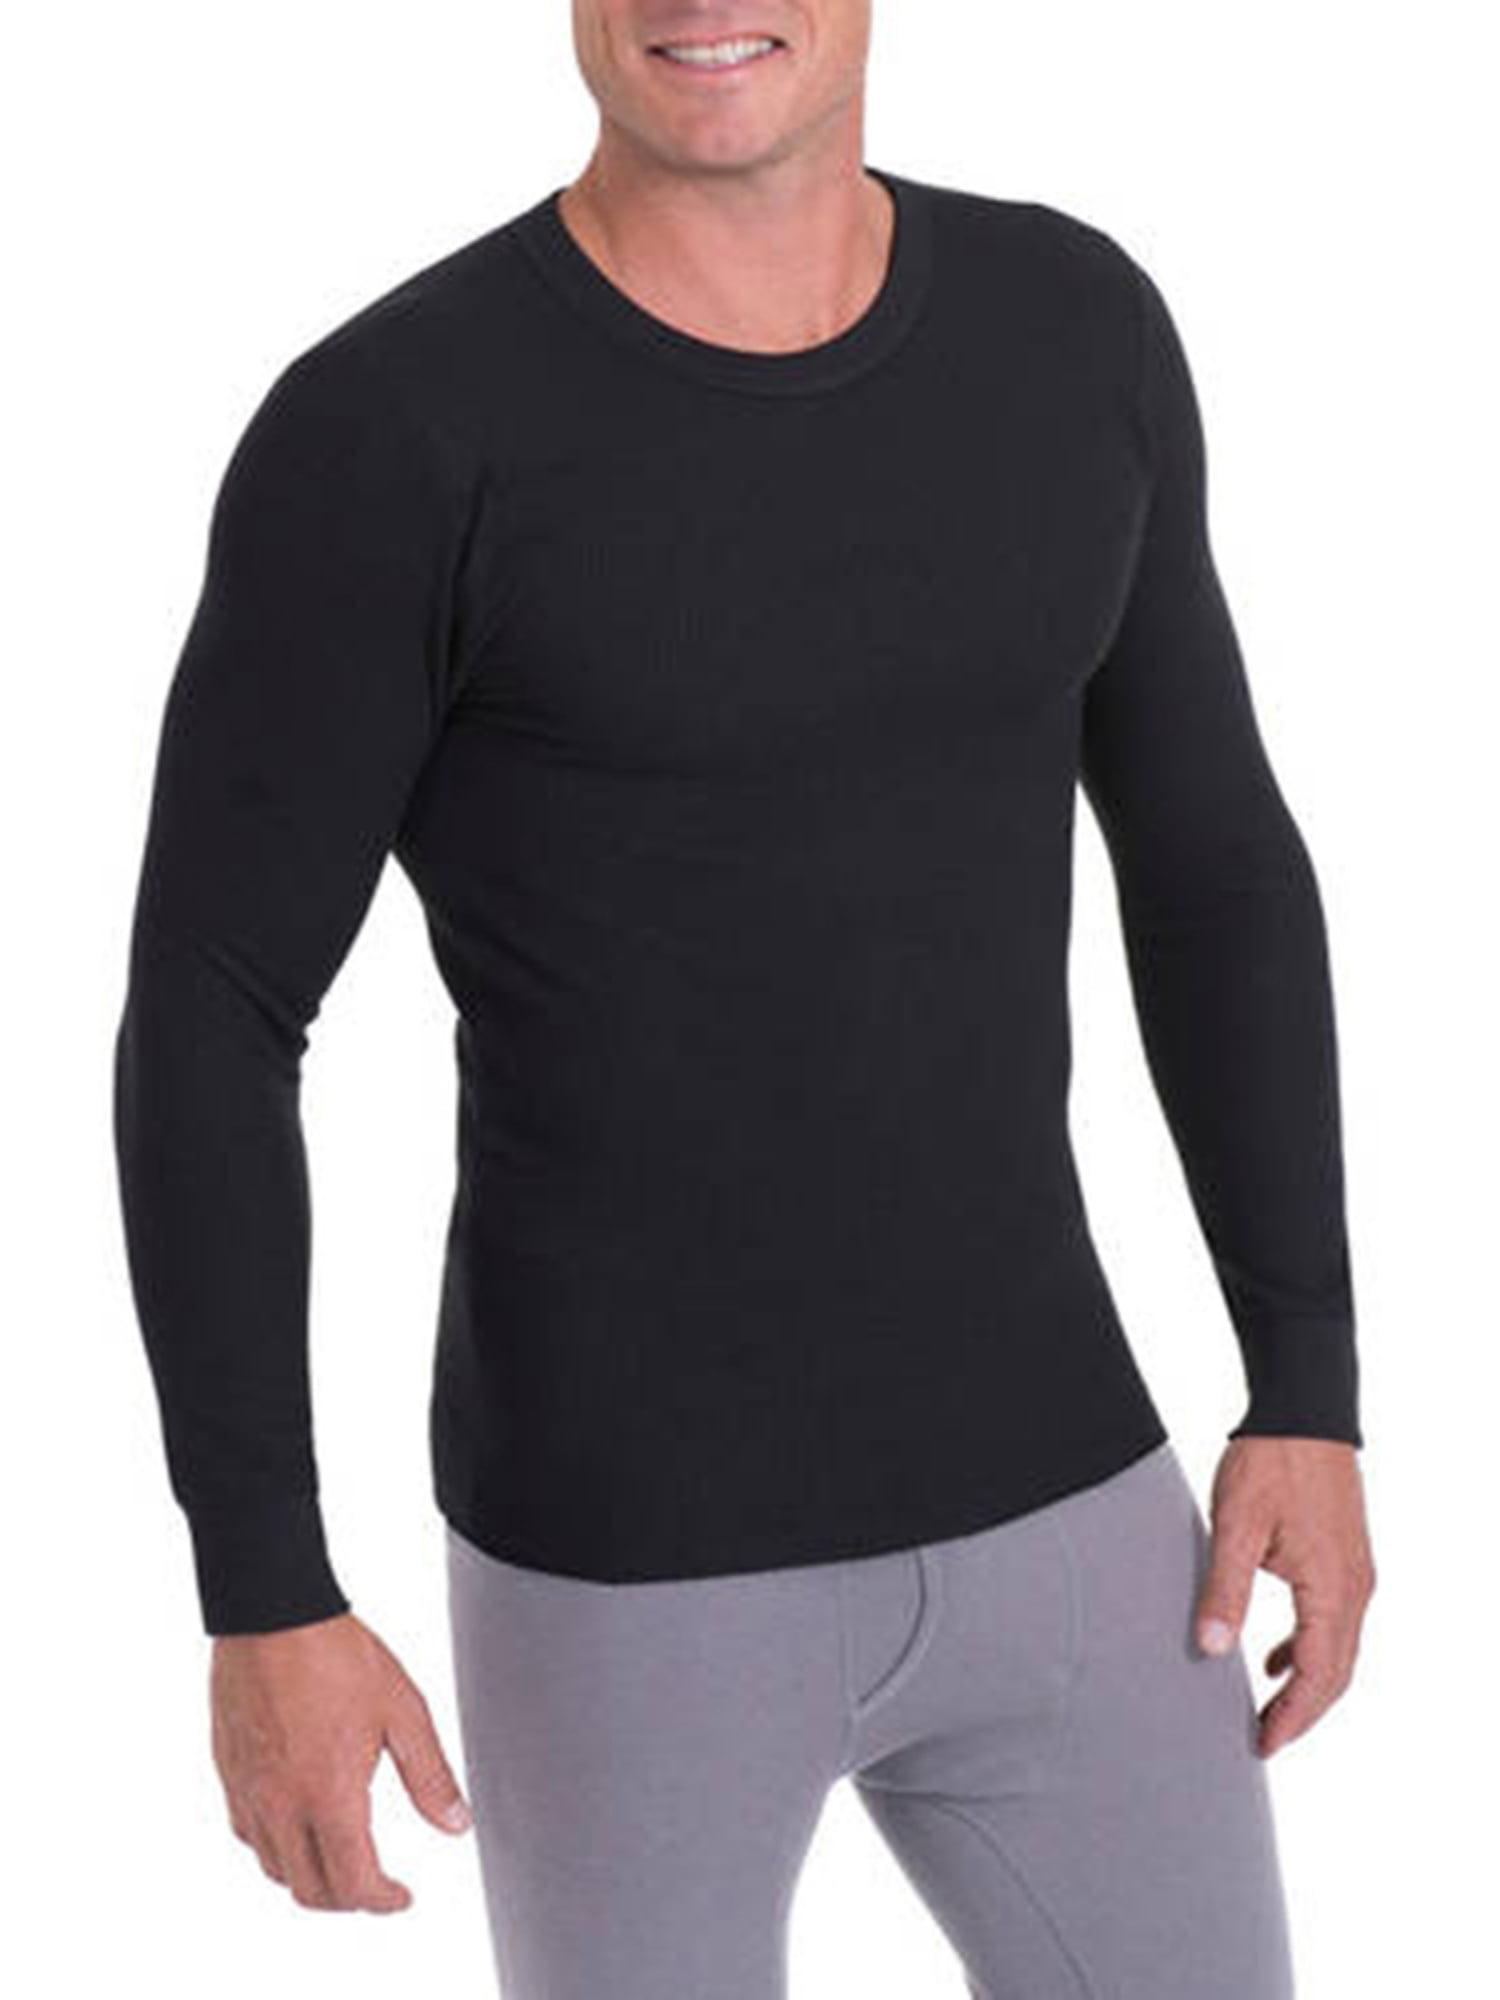 Fruit of the Loom Big Men's Classic Thermal Underwear Top by Long Underwear